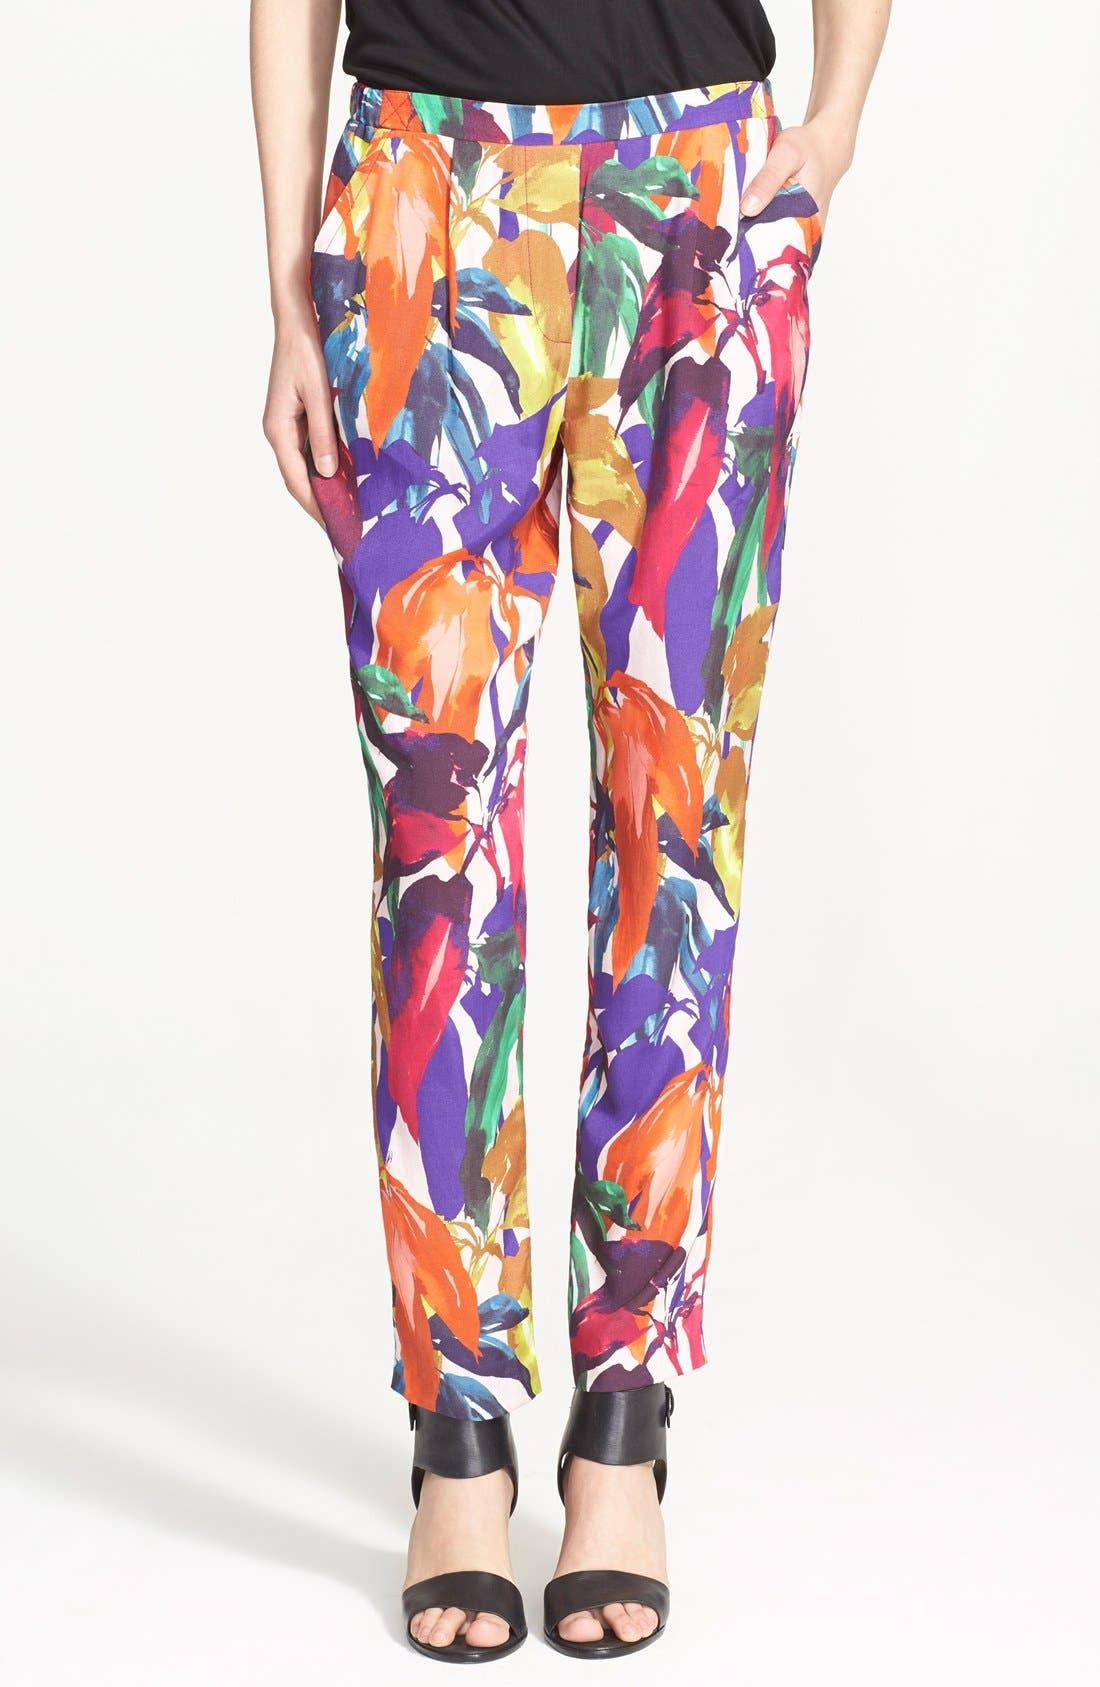 Alternate Image 1 Selected - Trina Turk 'Gilly' Print Pants